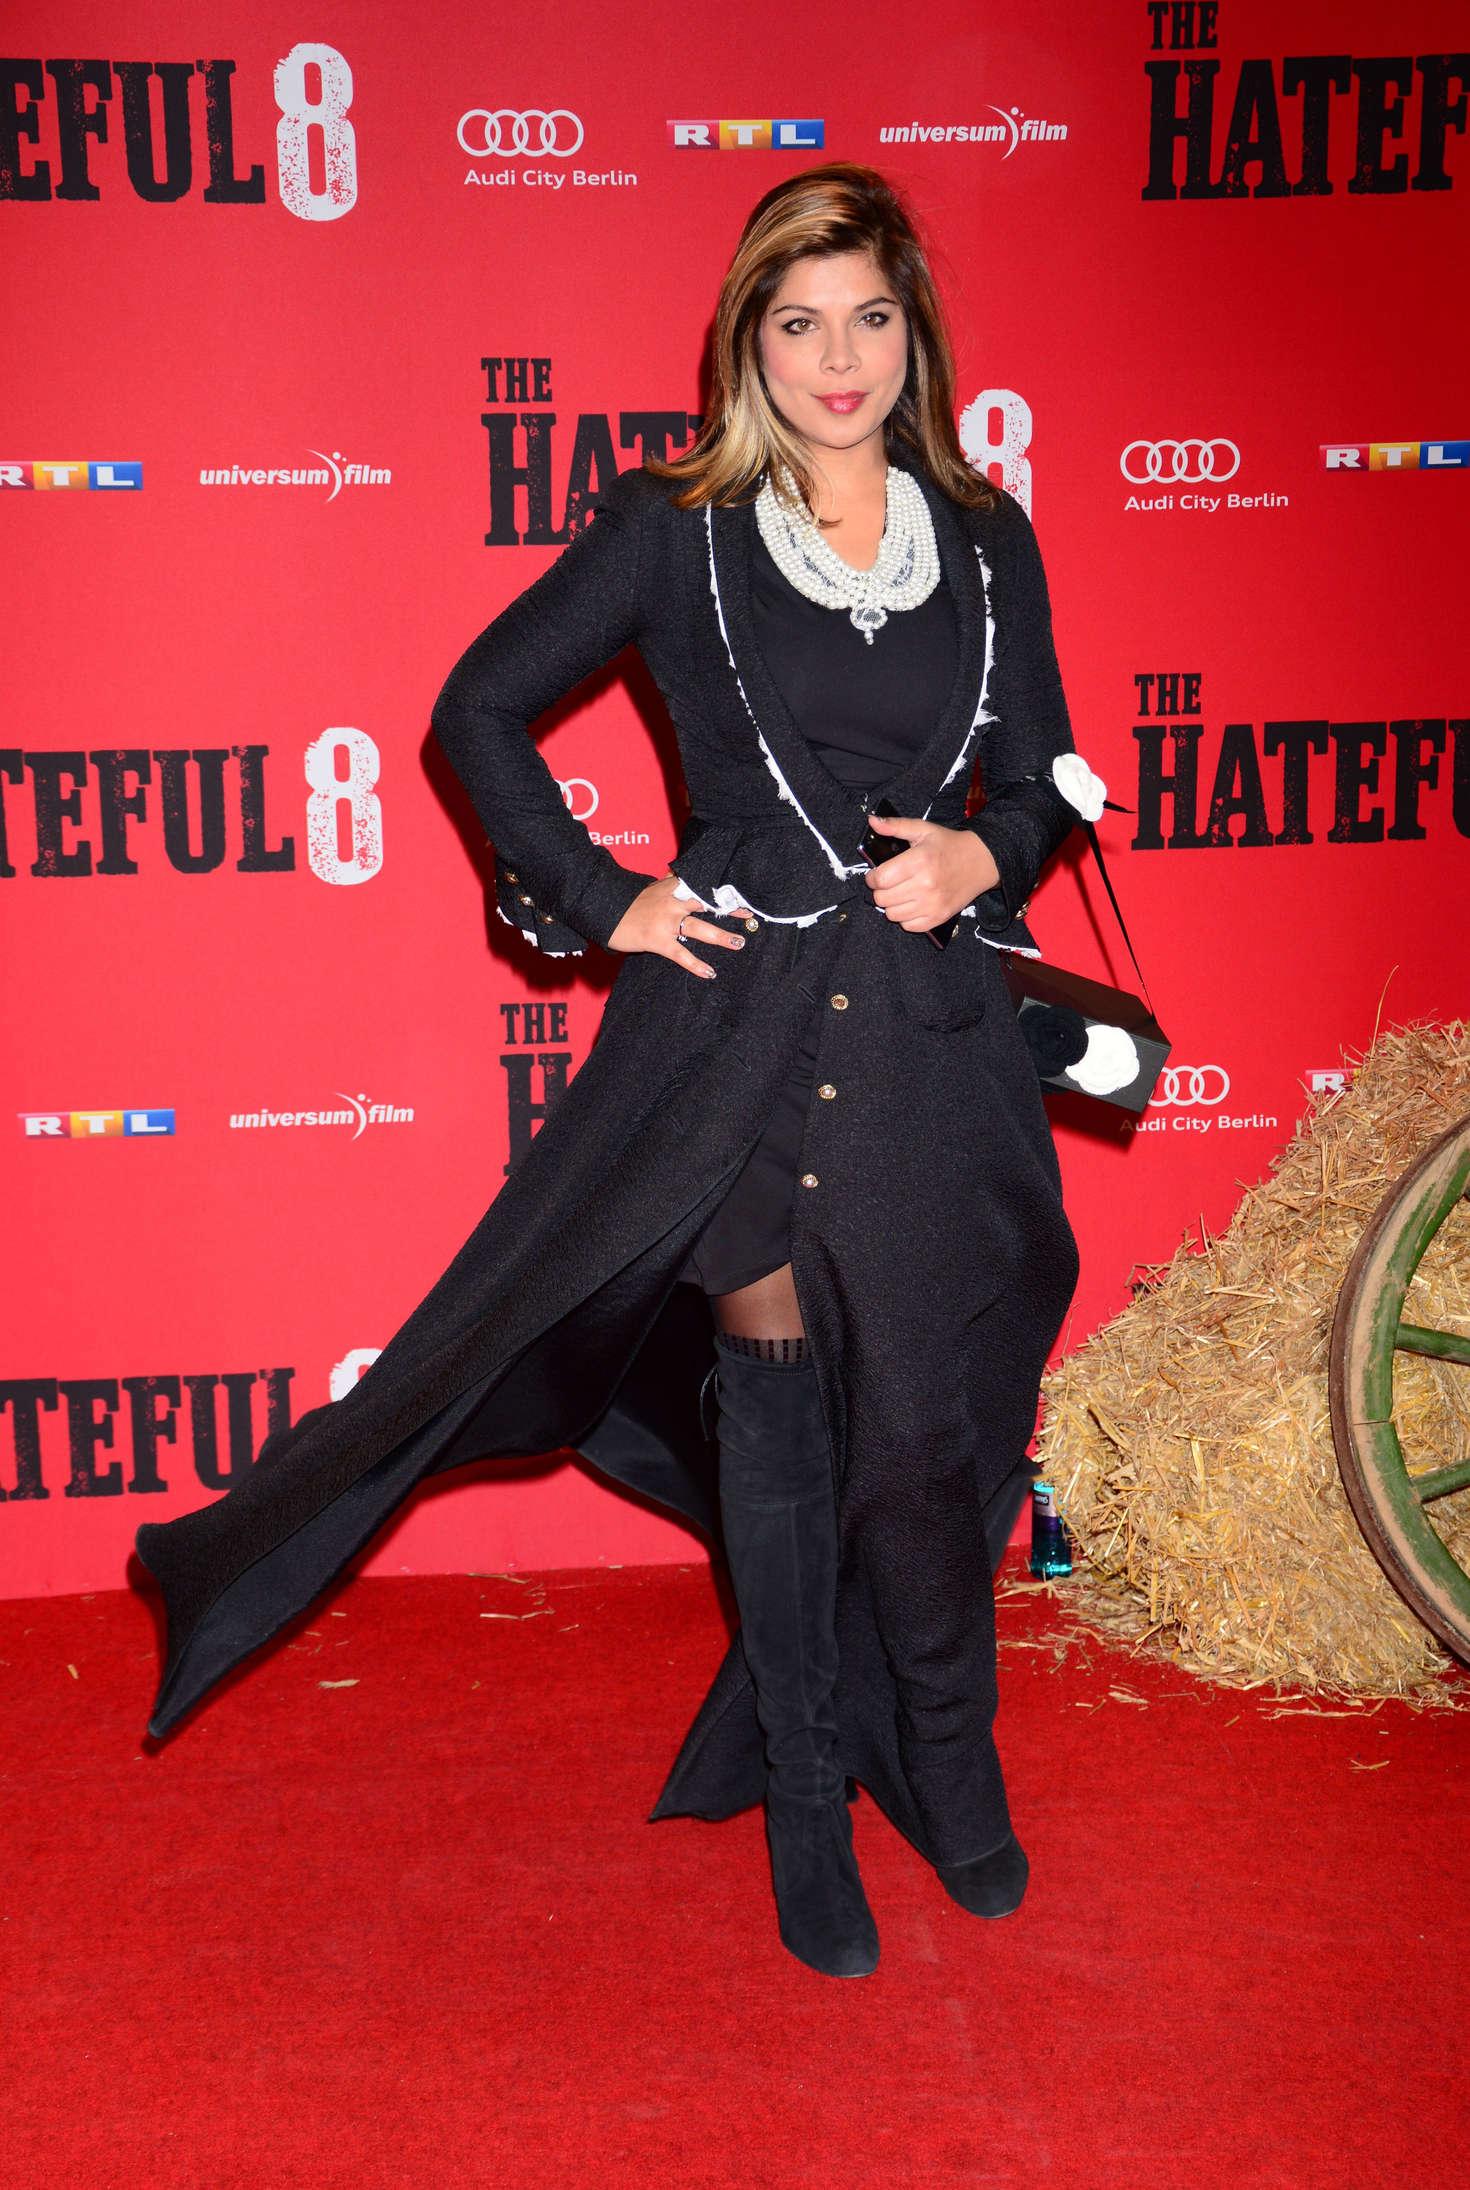 Indira Weis The Hateful Premiere in Berlin